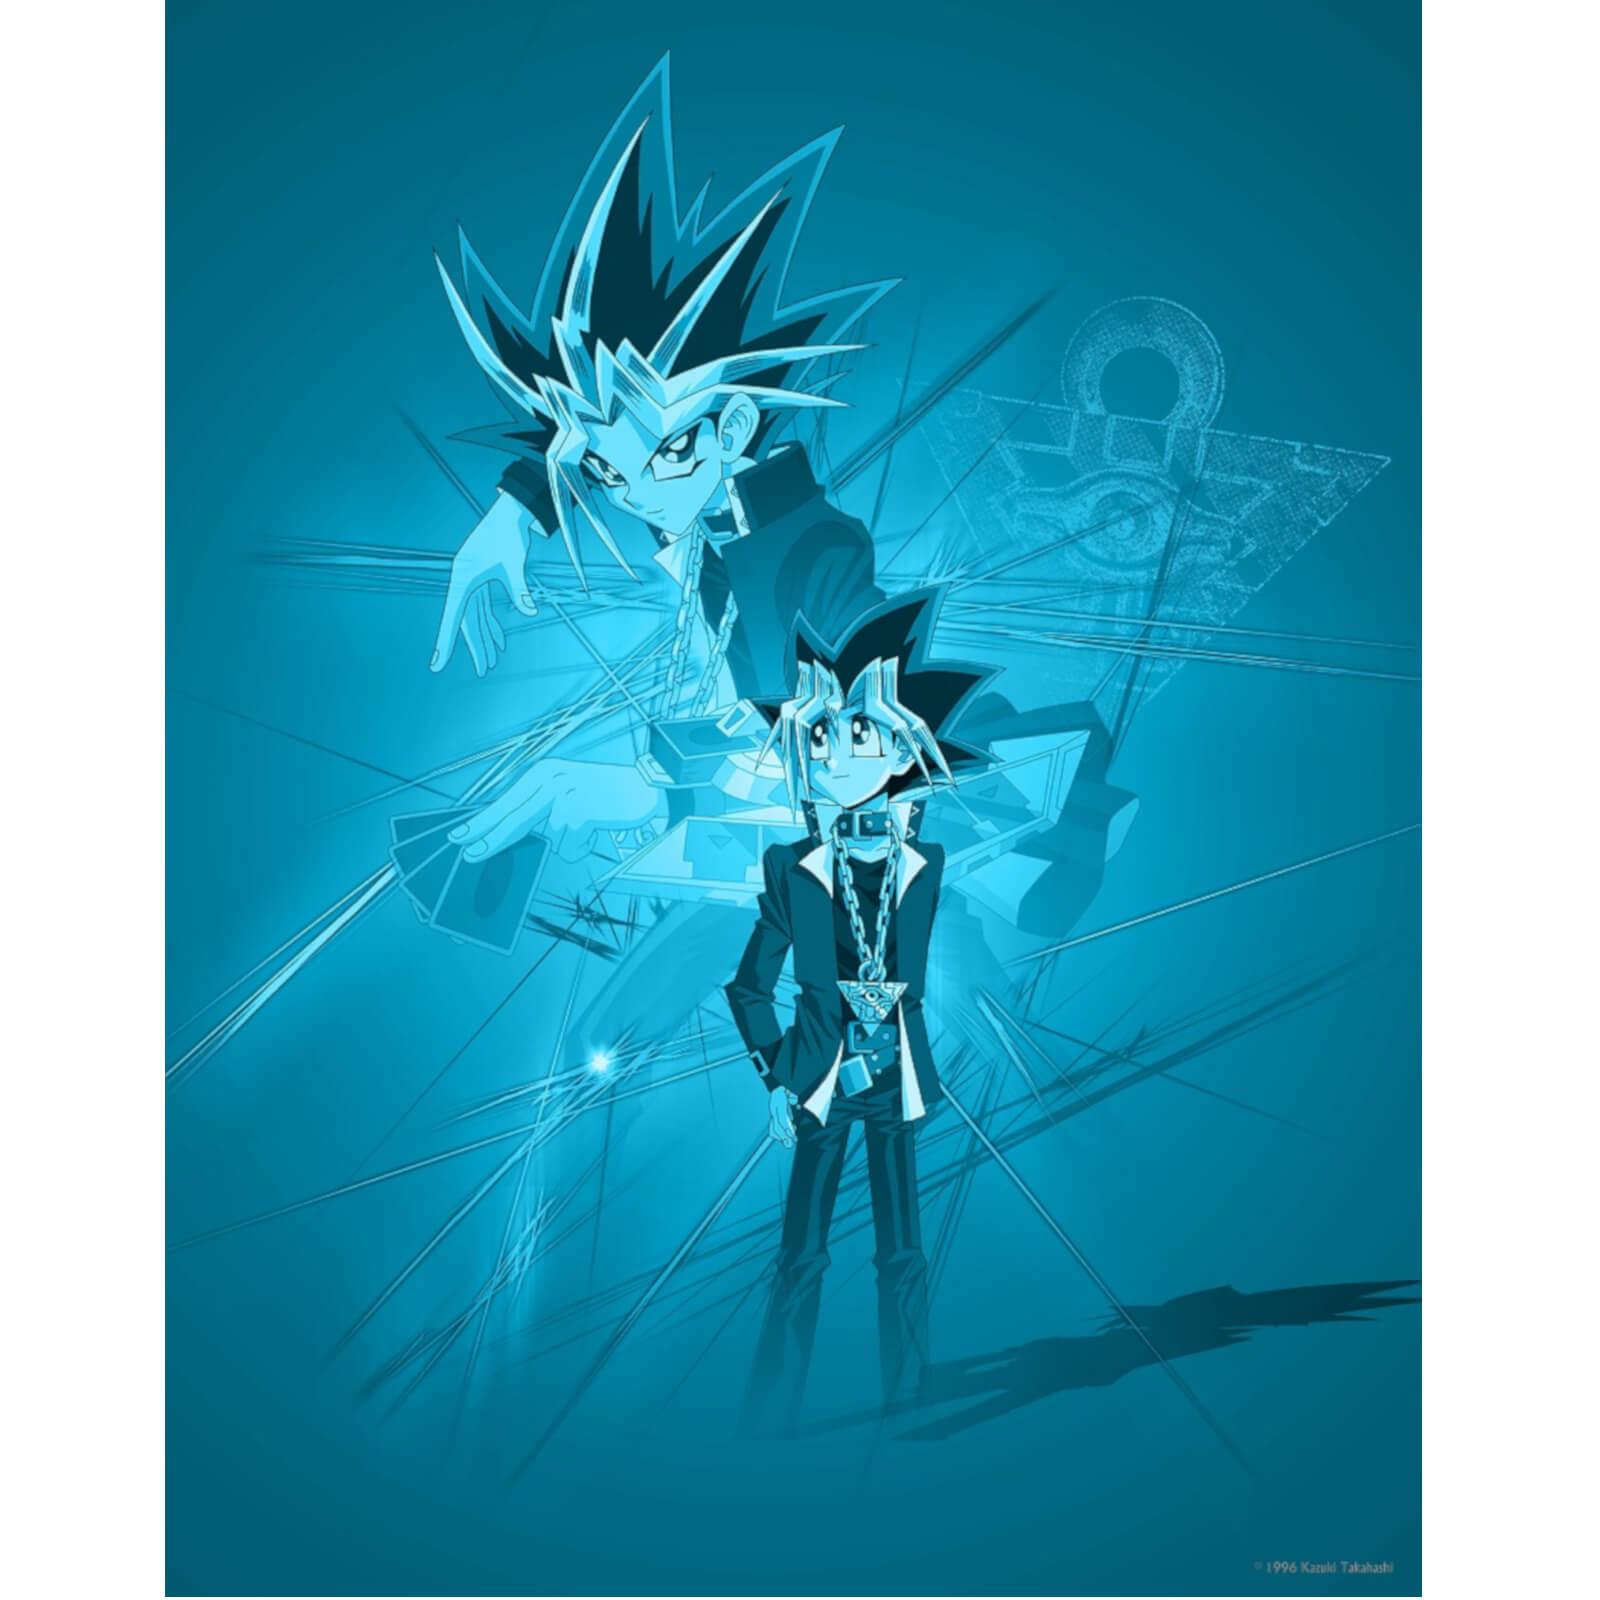 Yu-Gi-Oh! Limited Edition Art Print